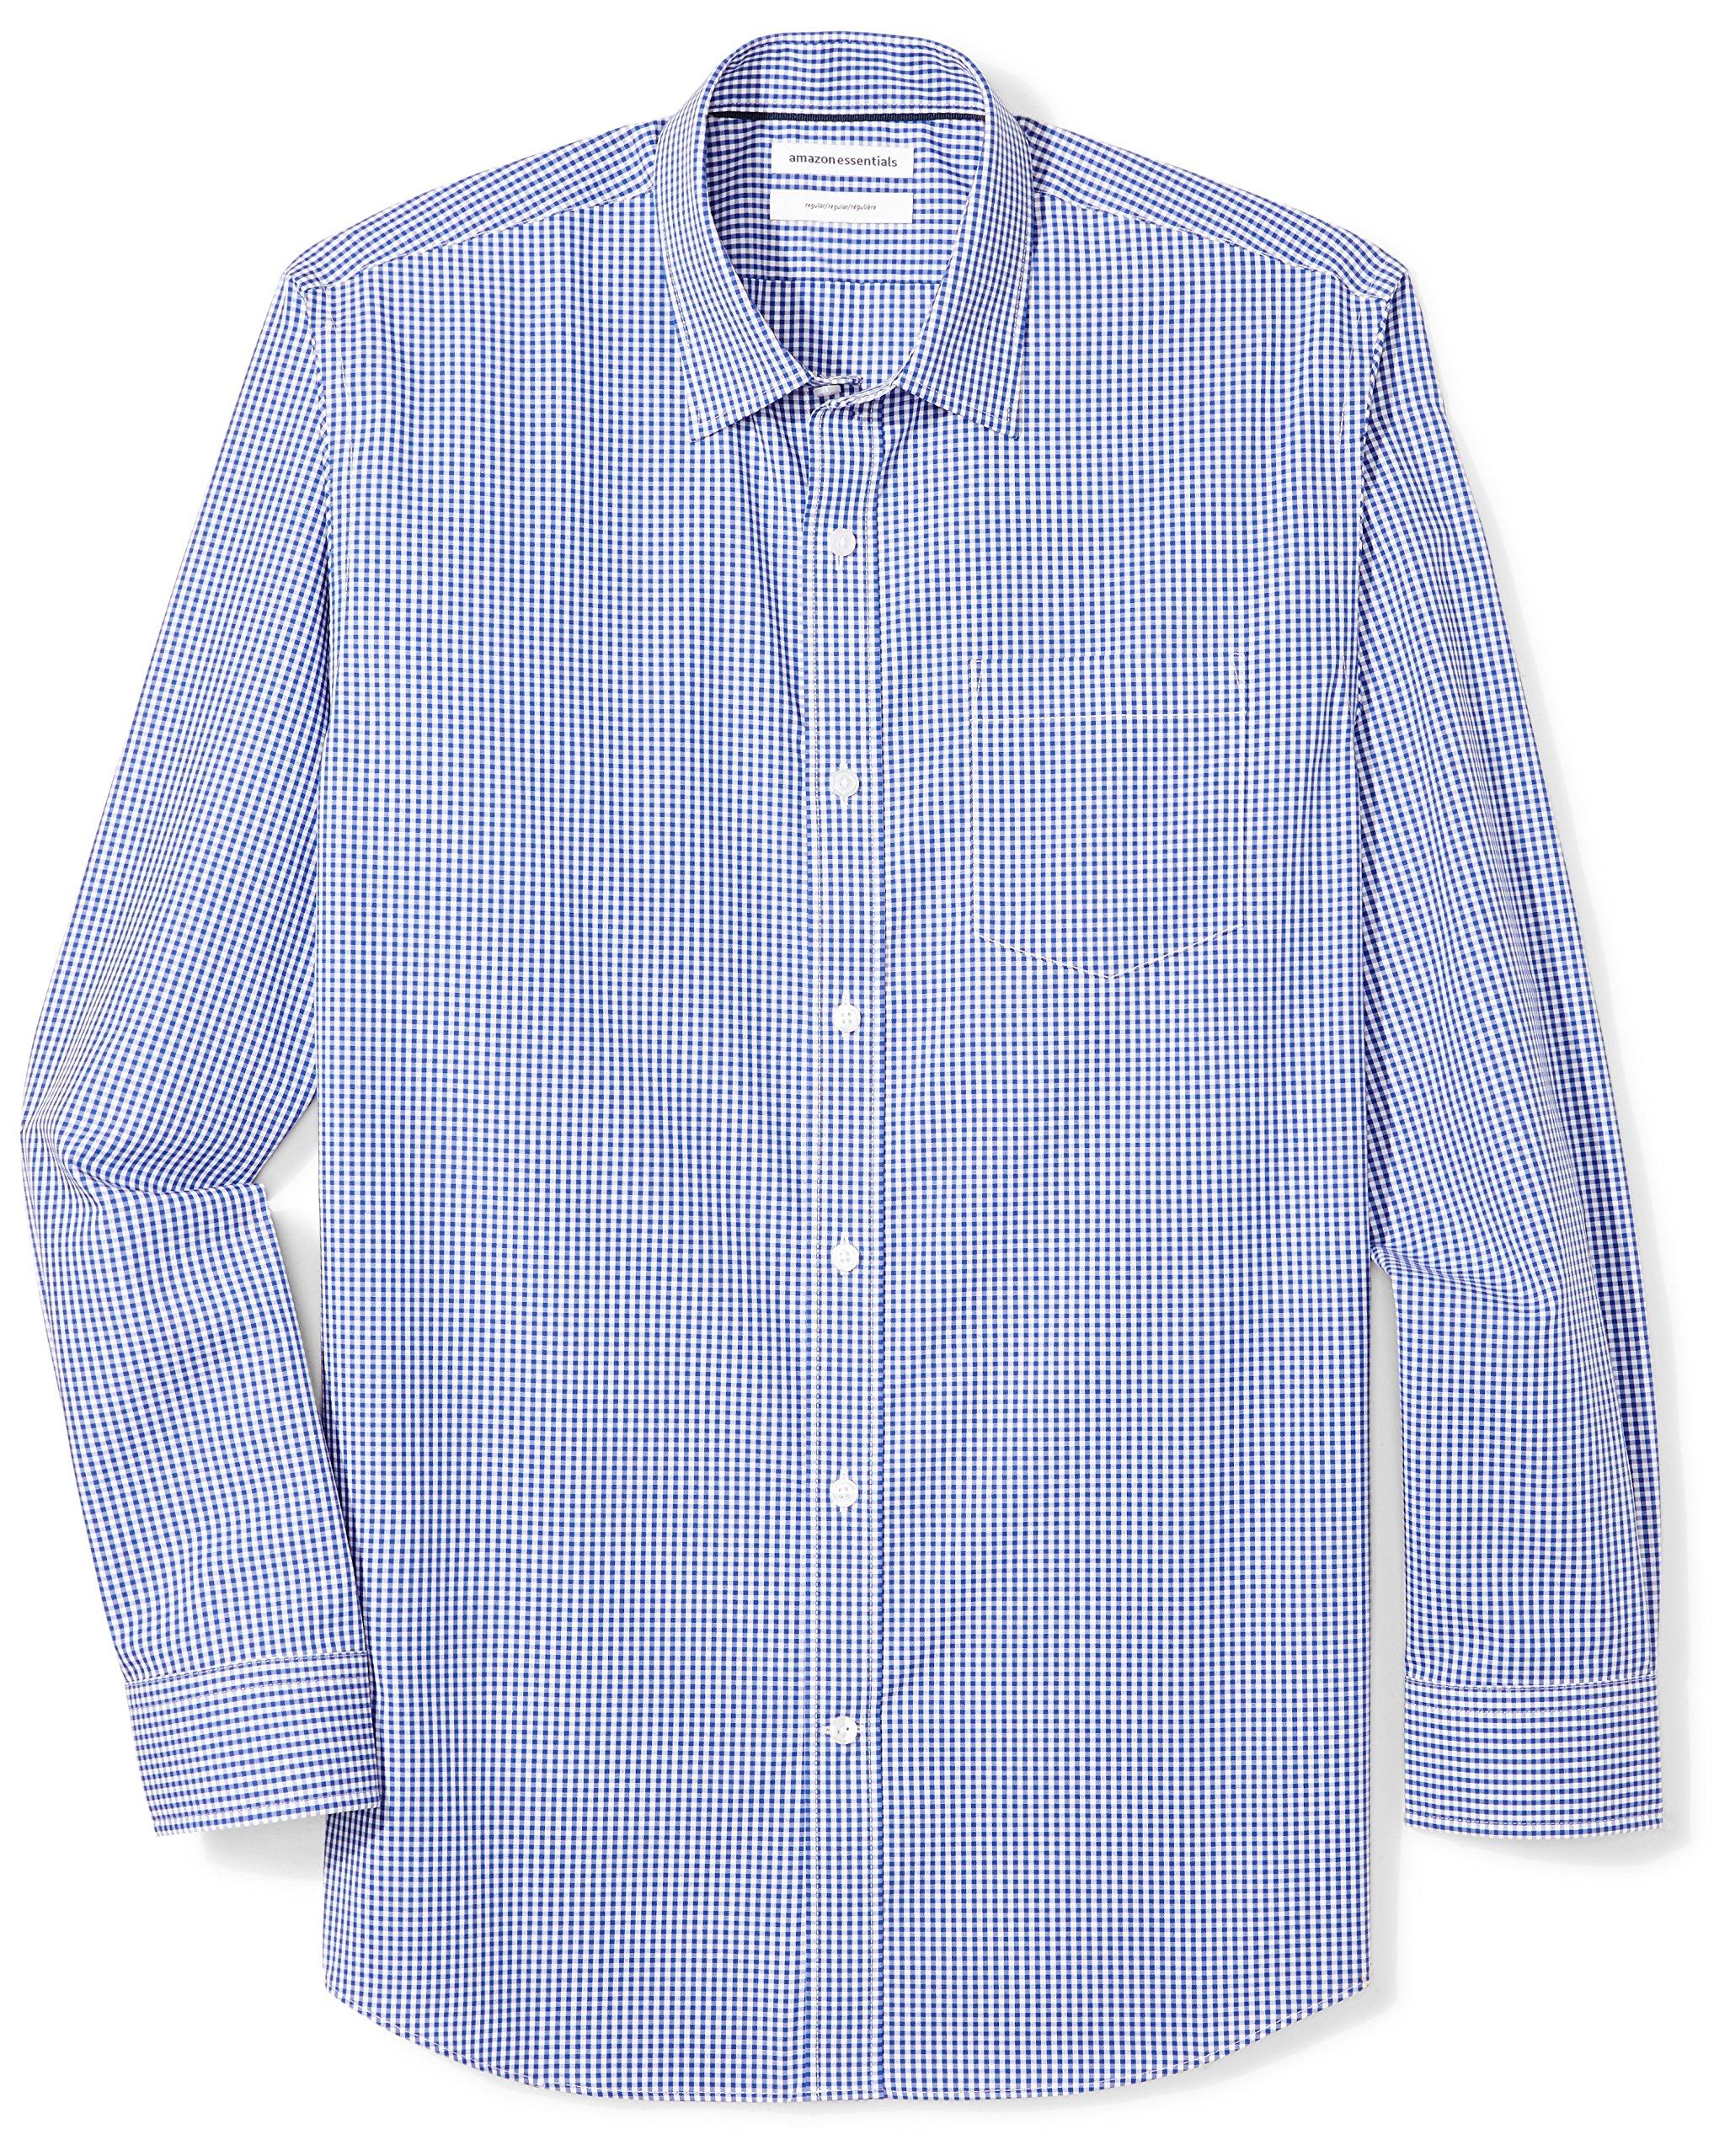 Amazon Essentials Men's Regular-Fit Wrinkle-Resistant Long-Sleeve Plaid Dress Shirt, Blue Gingham, 16.5'' Neck 32''-33'' Sleeve